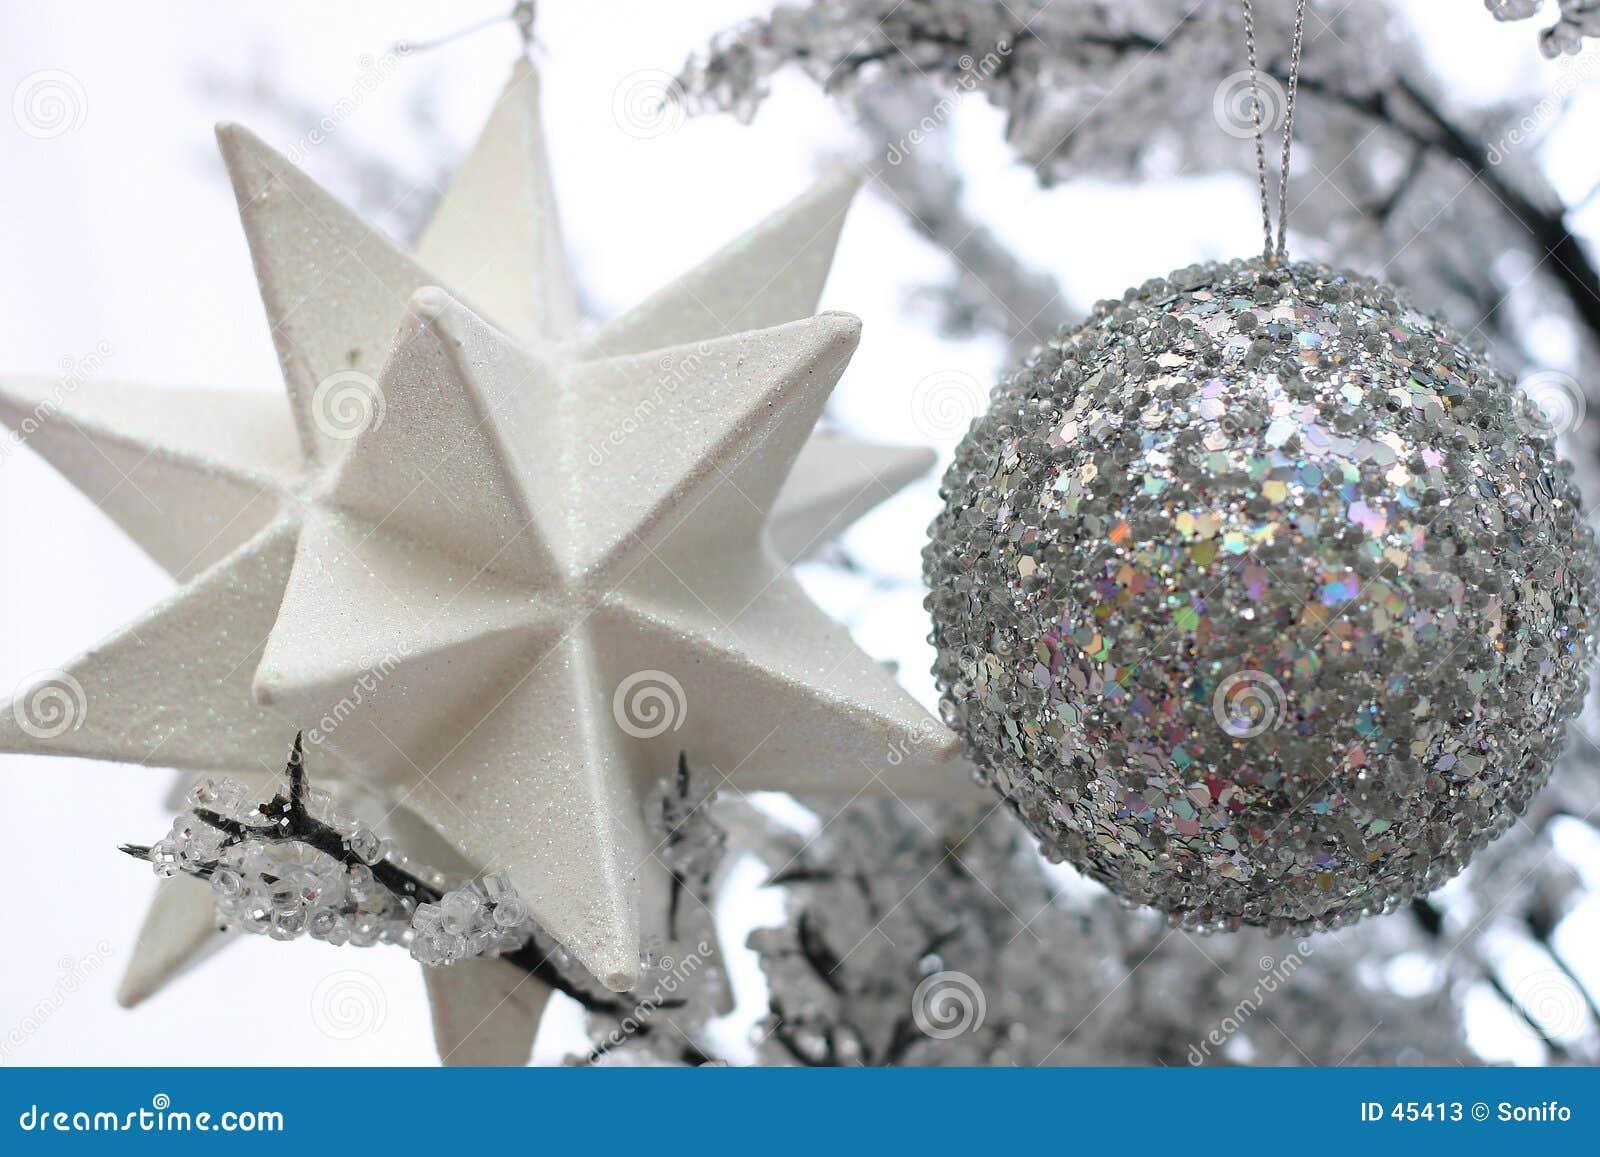 2 ornament